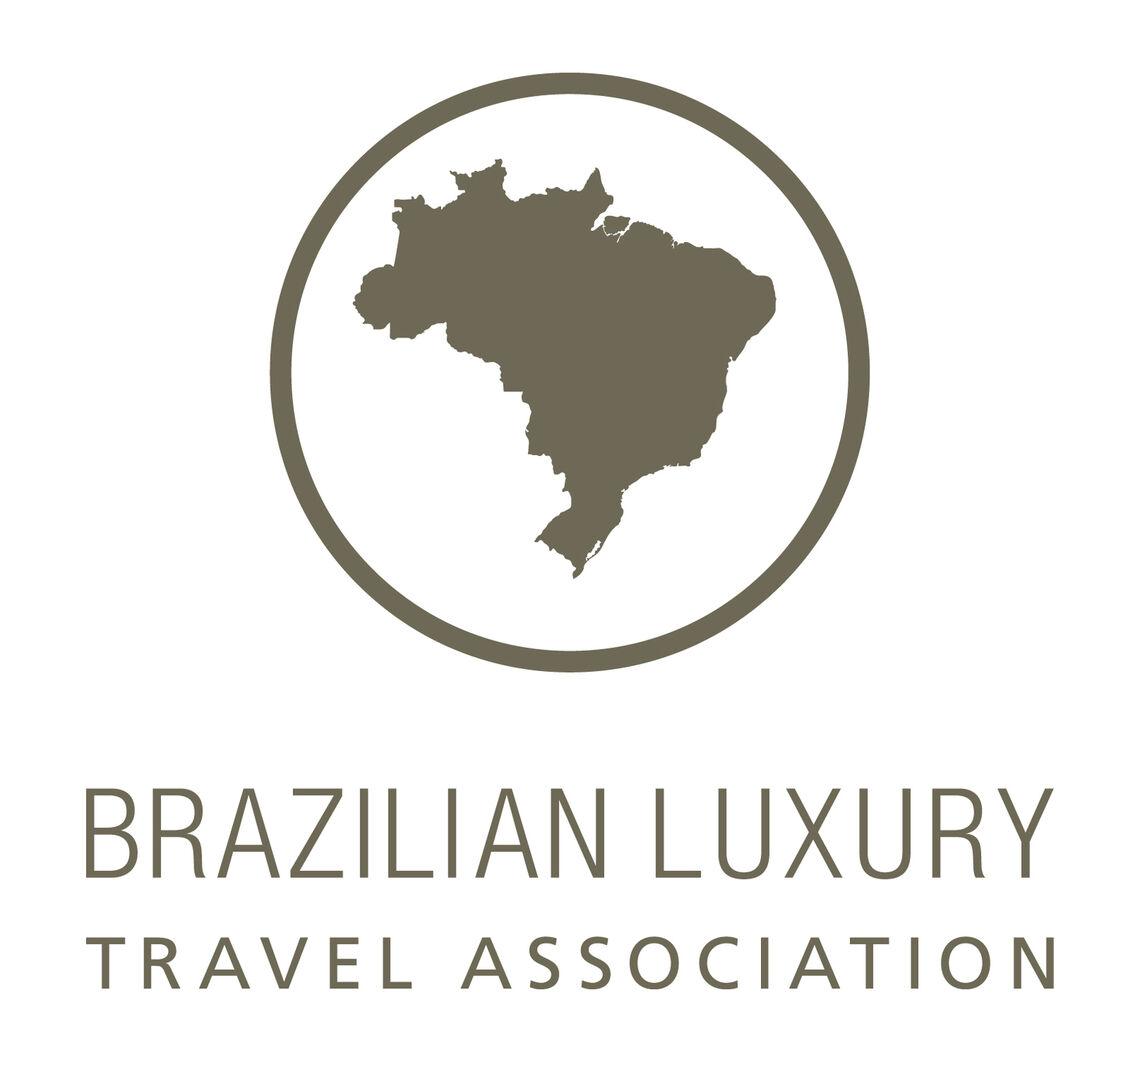 Brazilian Luxury Travel Association